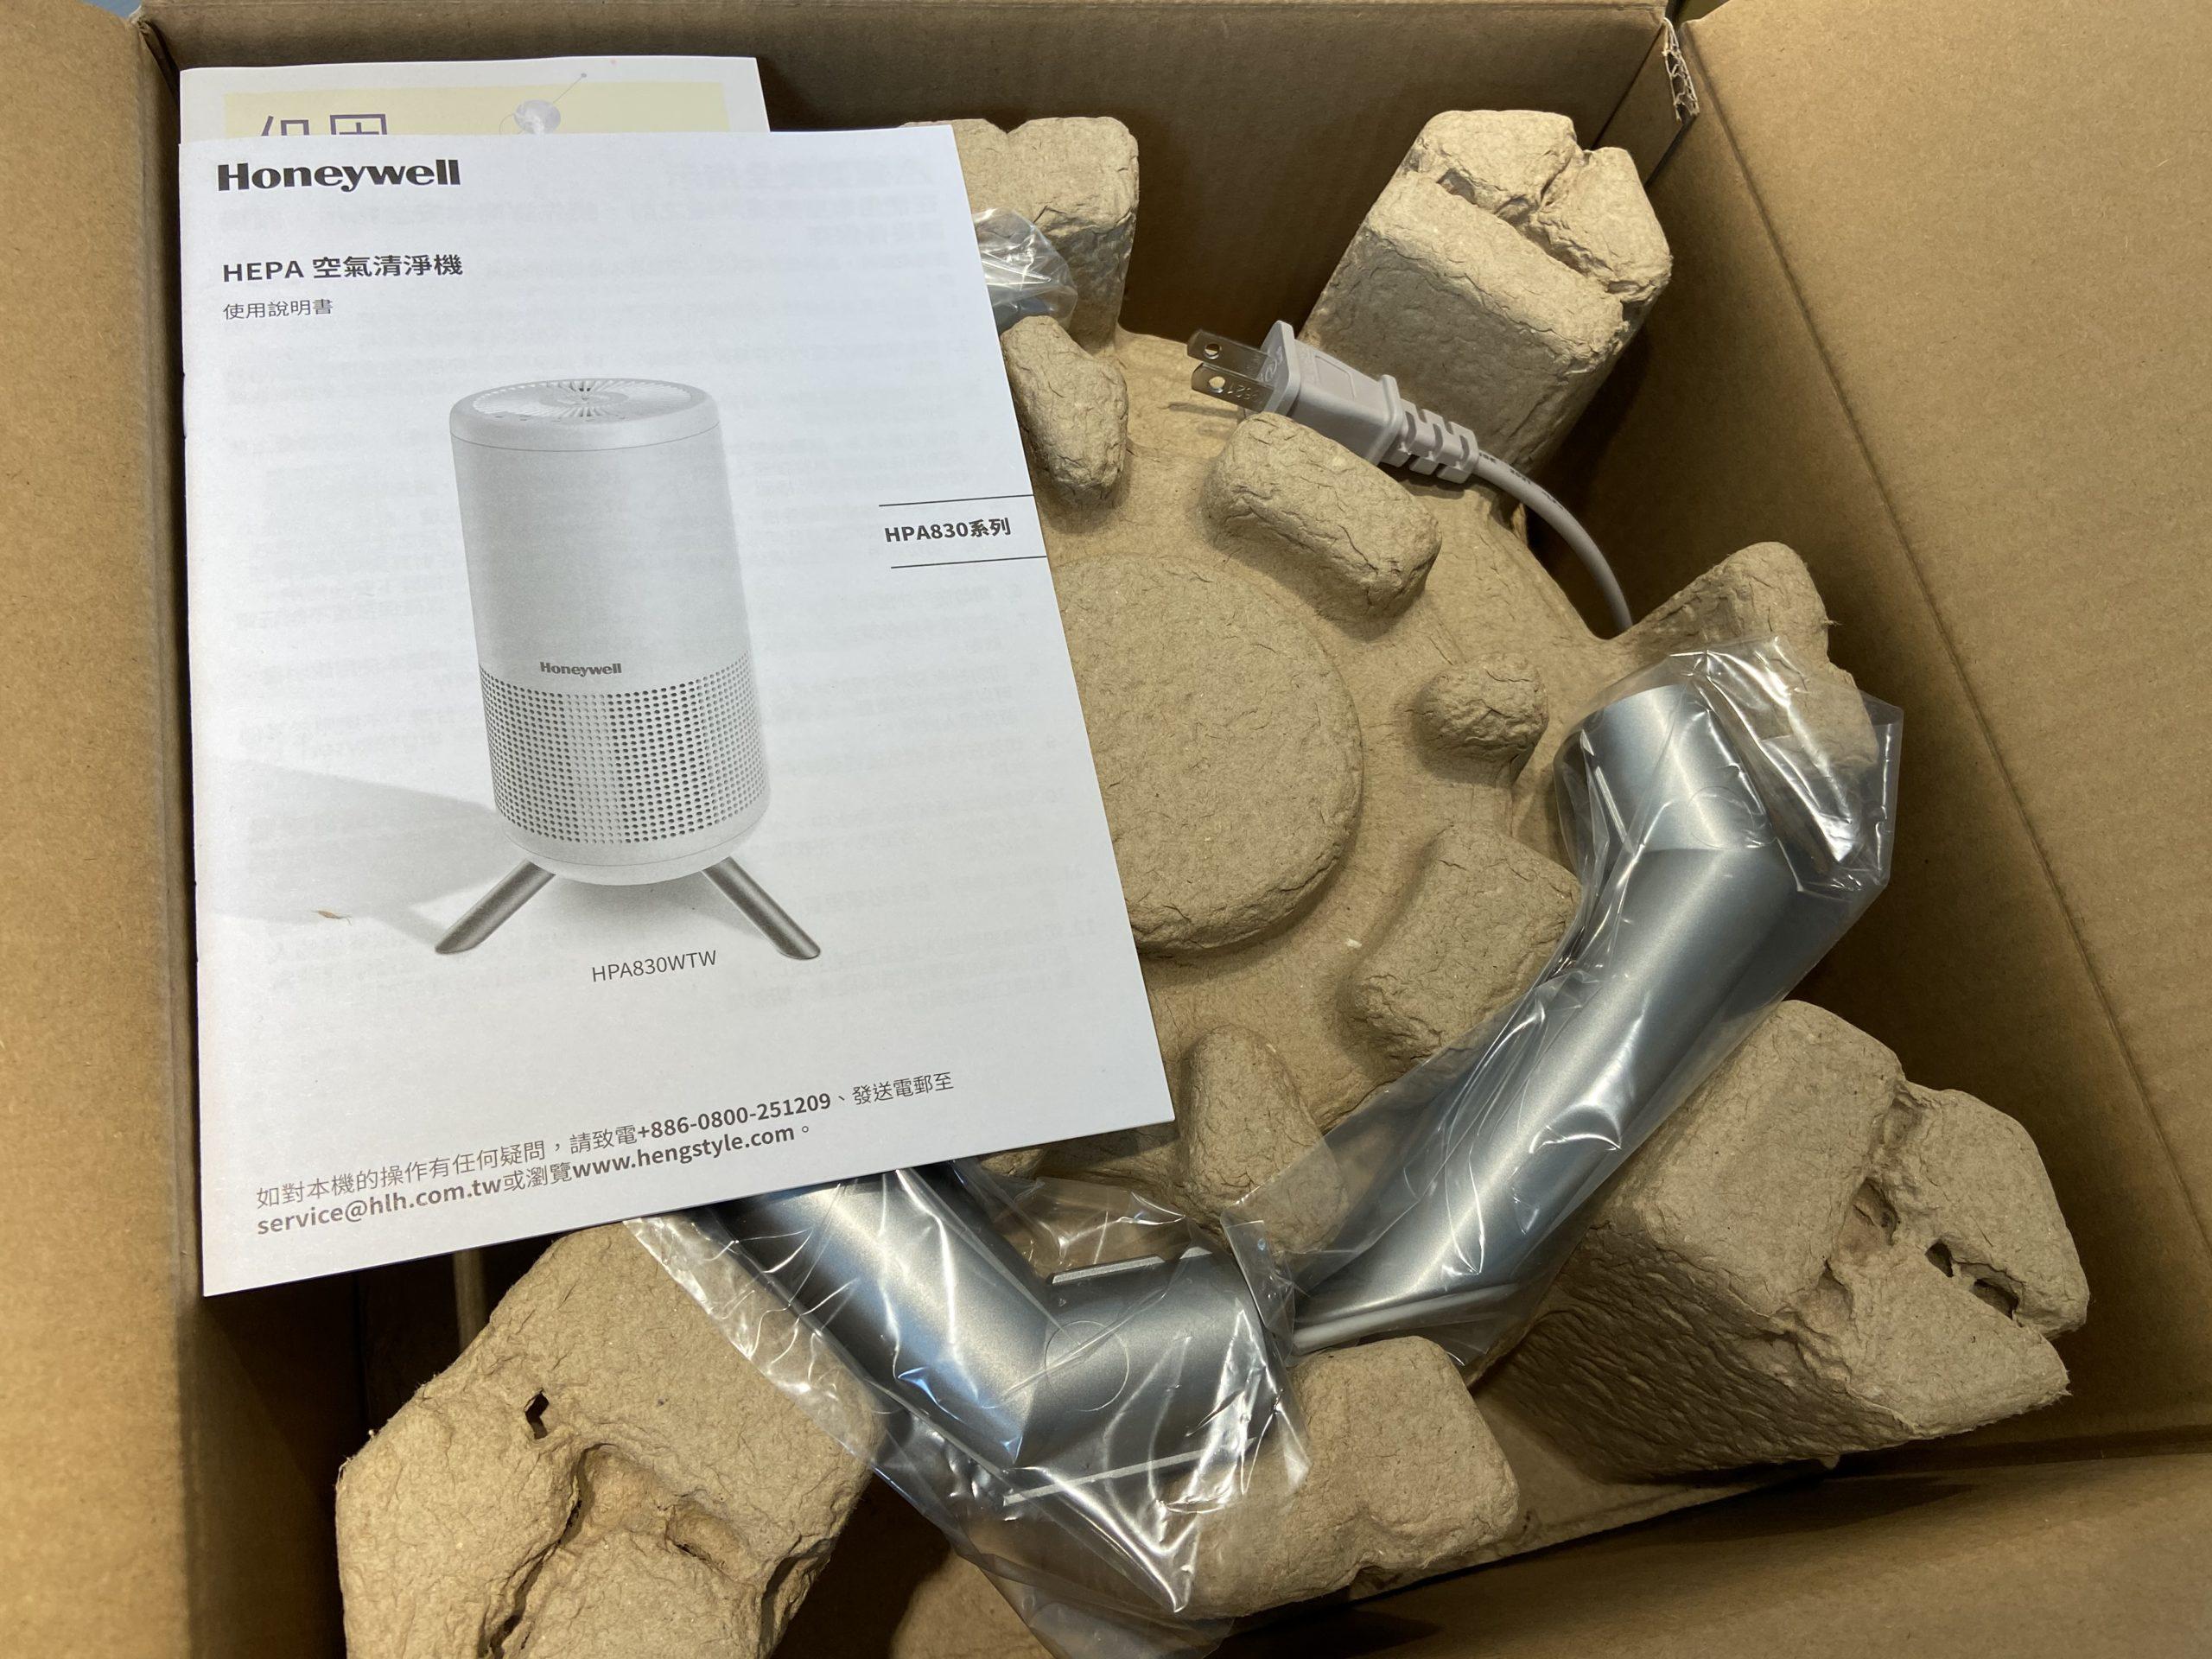 Honeywell HPA 830 淨香氛空氣清淨機 包裝介紹 圖1